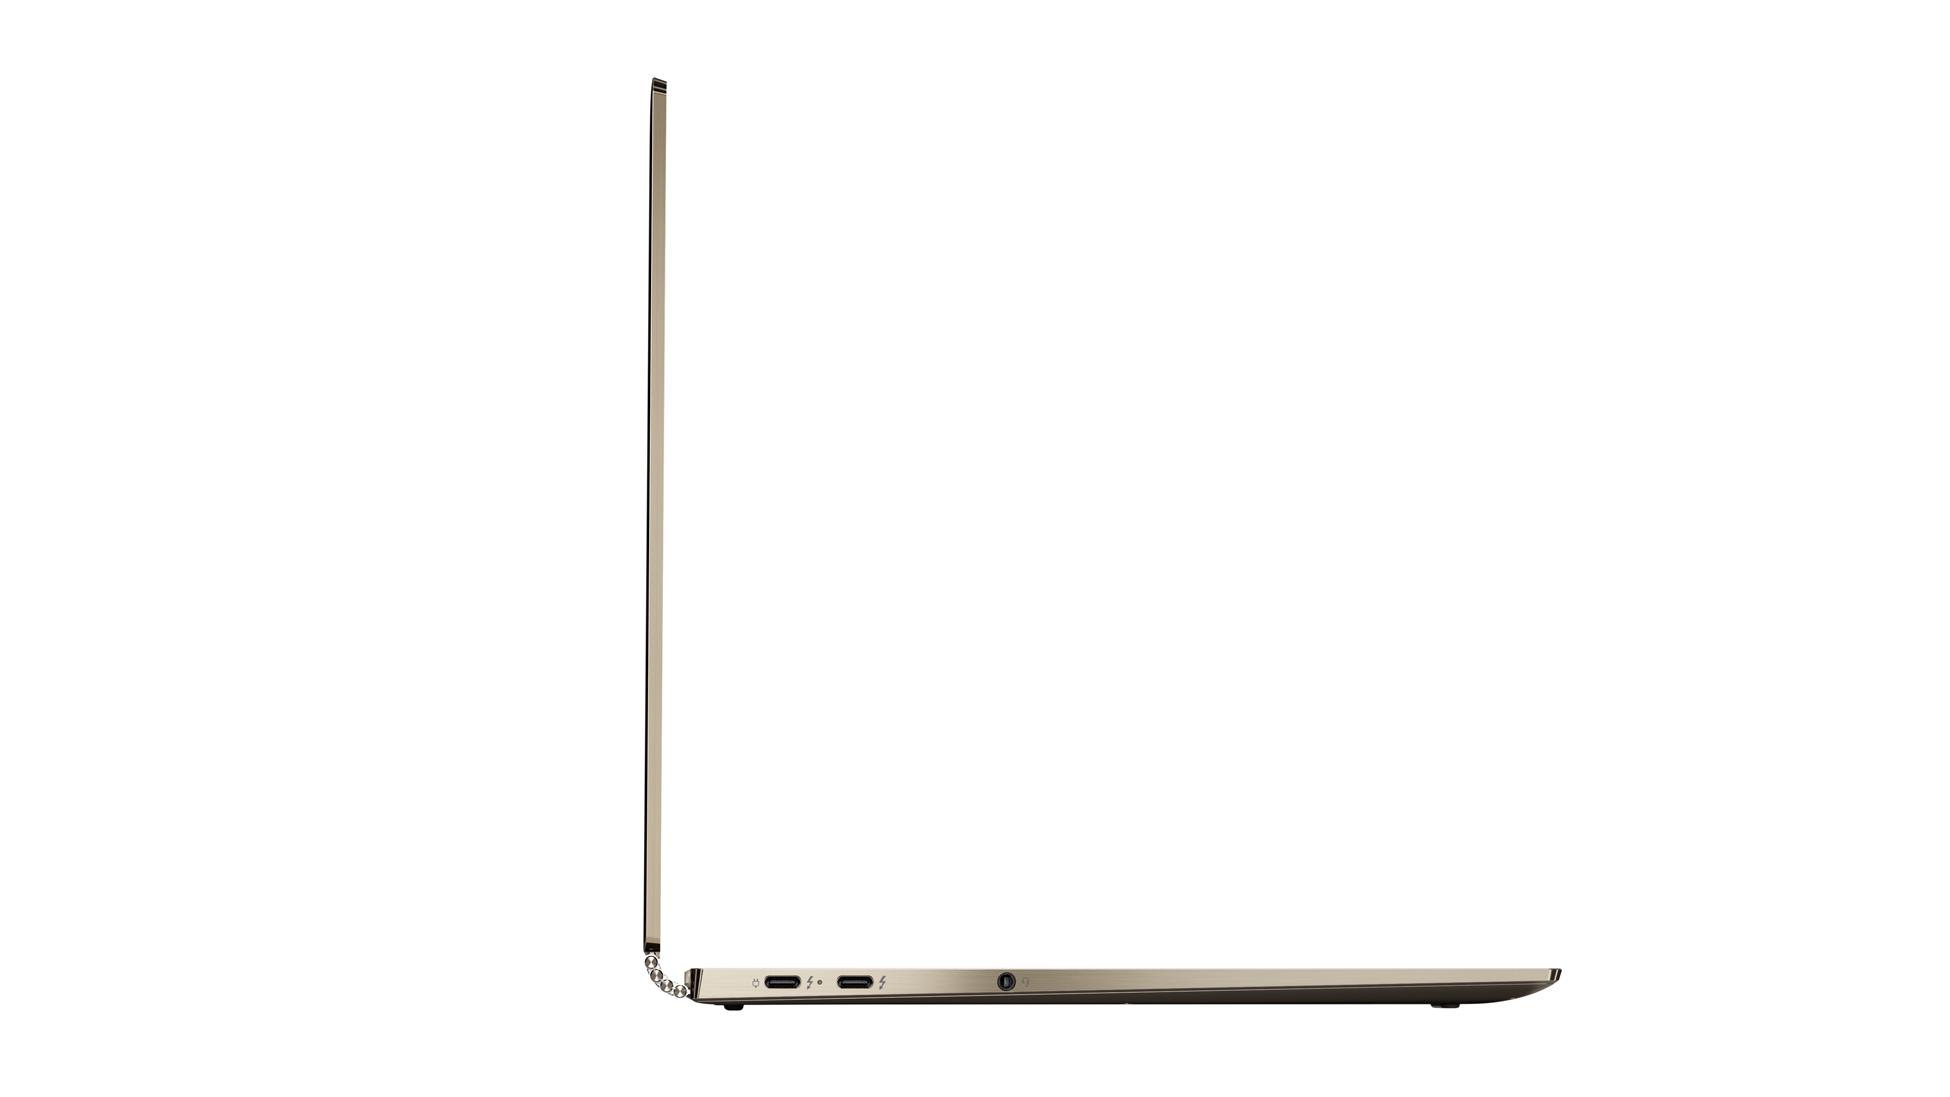 Фото  Ультрабук Lenovo Yoga 920 Bronze (80Y700A6RA)